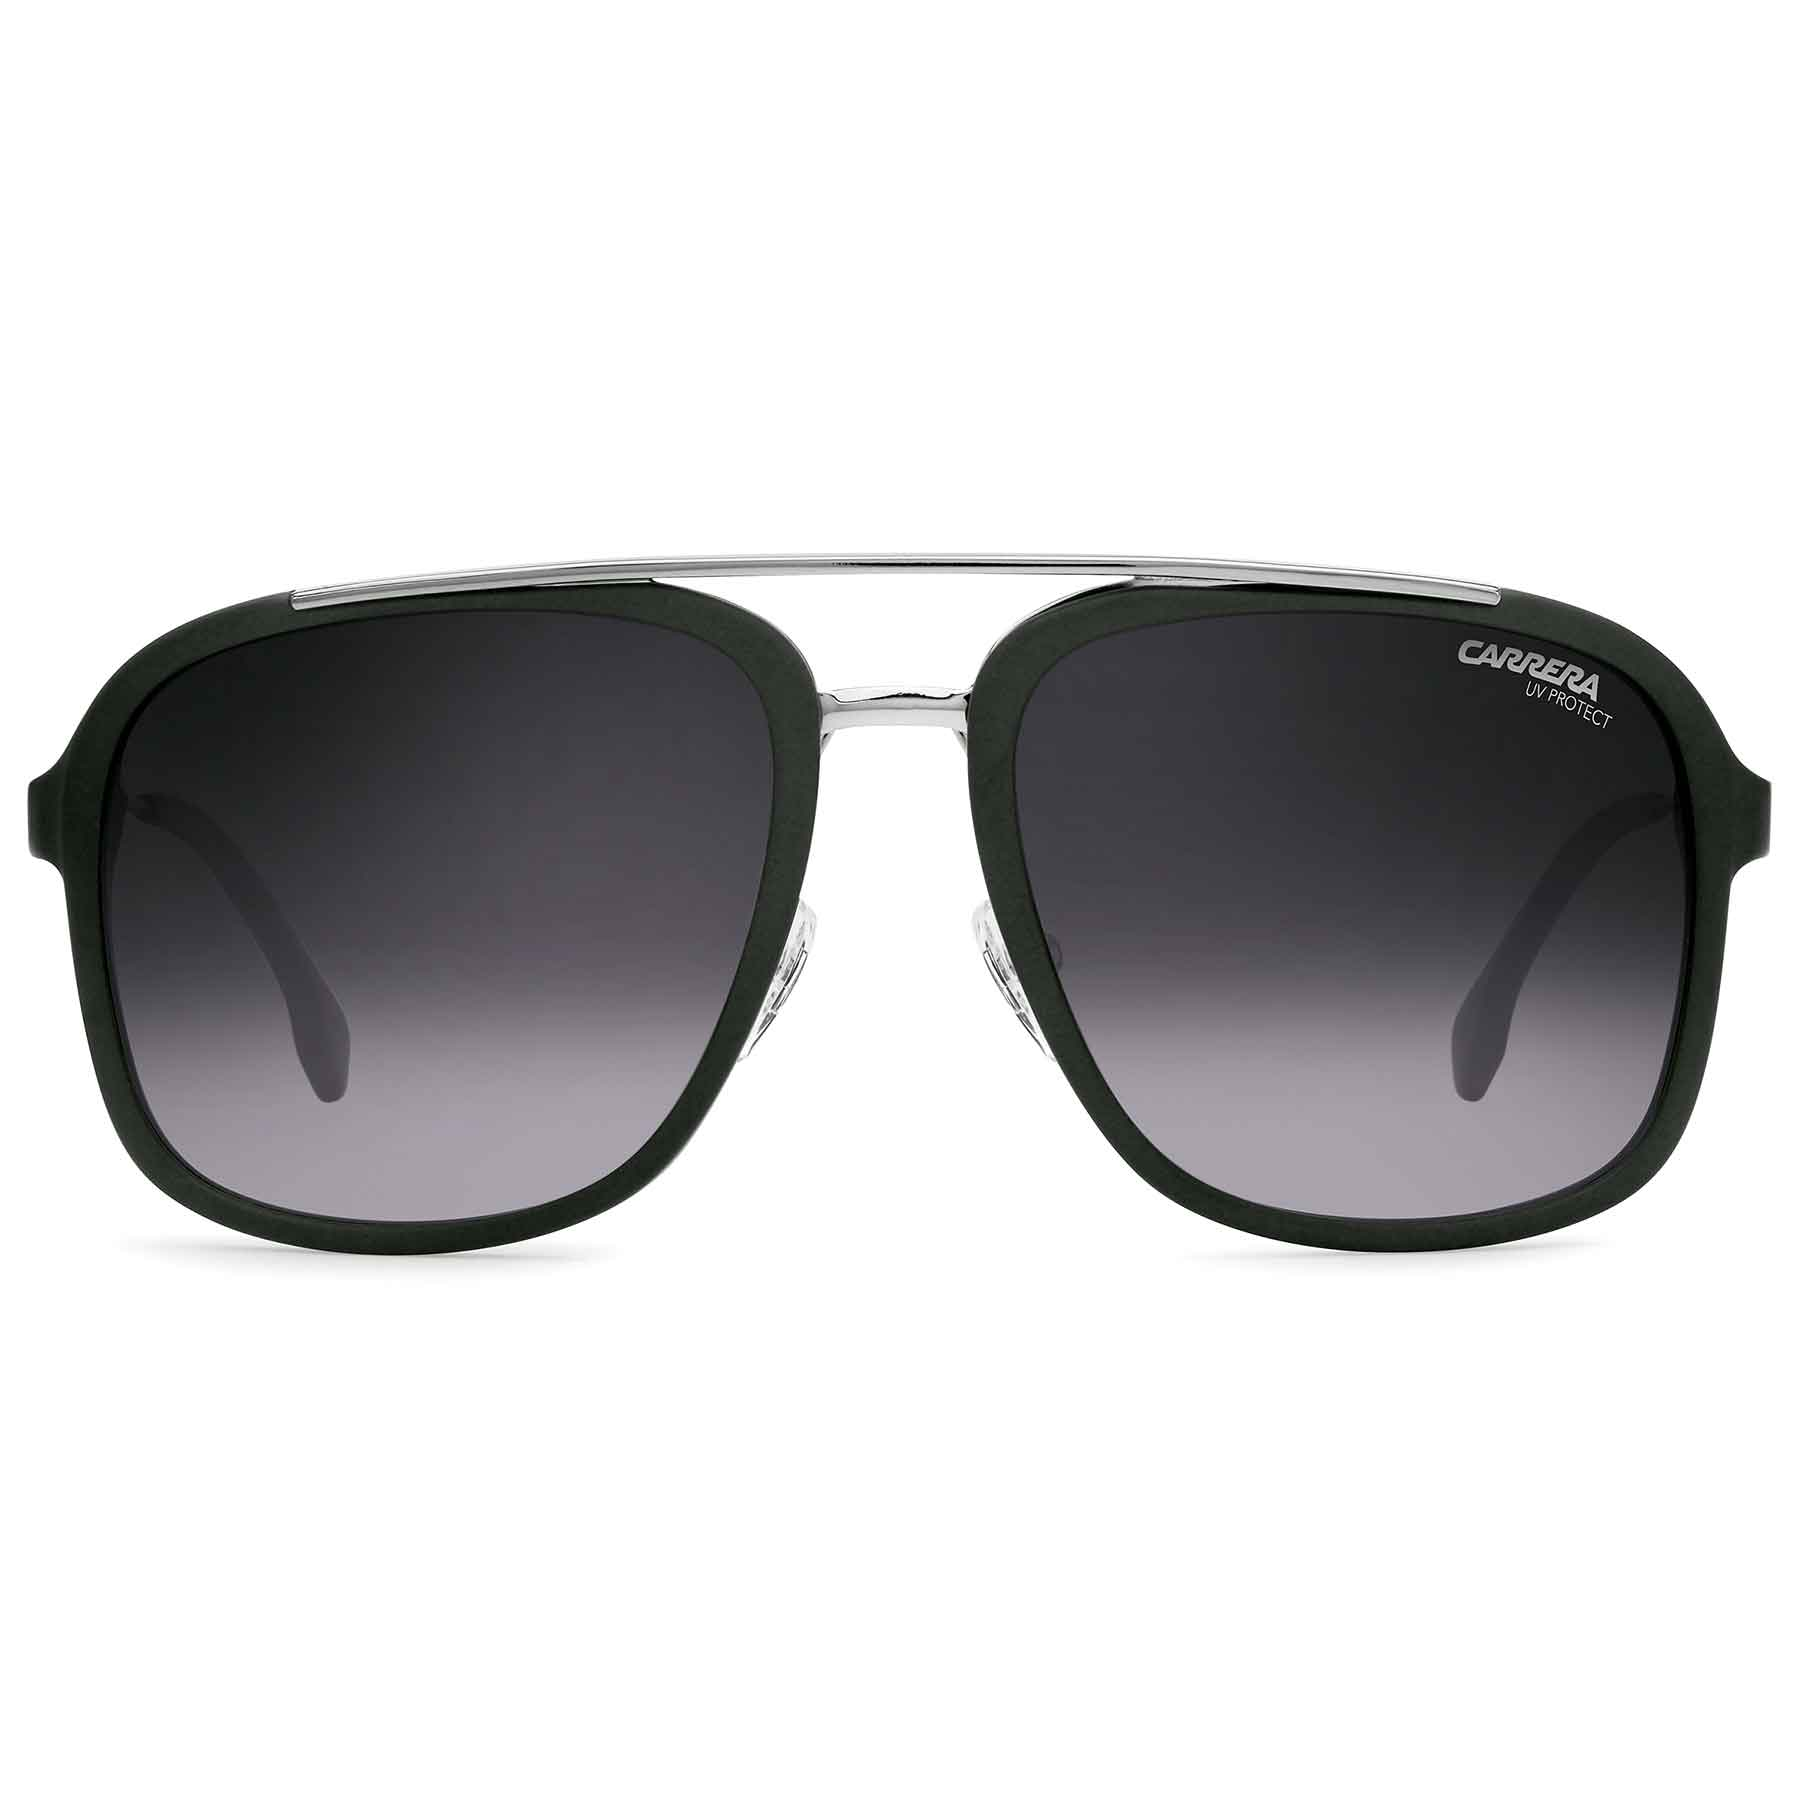 Gafas de Sol Carrera 133 TI7 Unisex